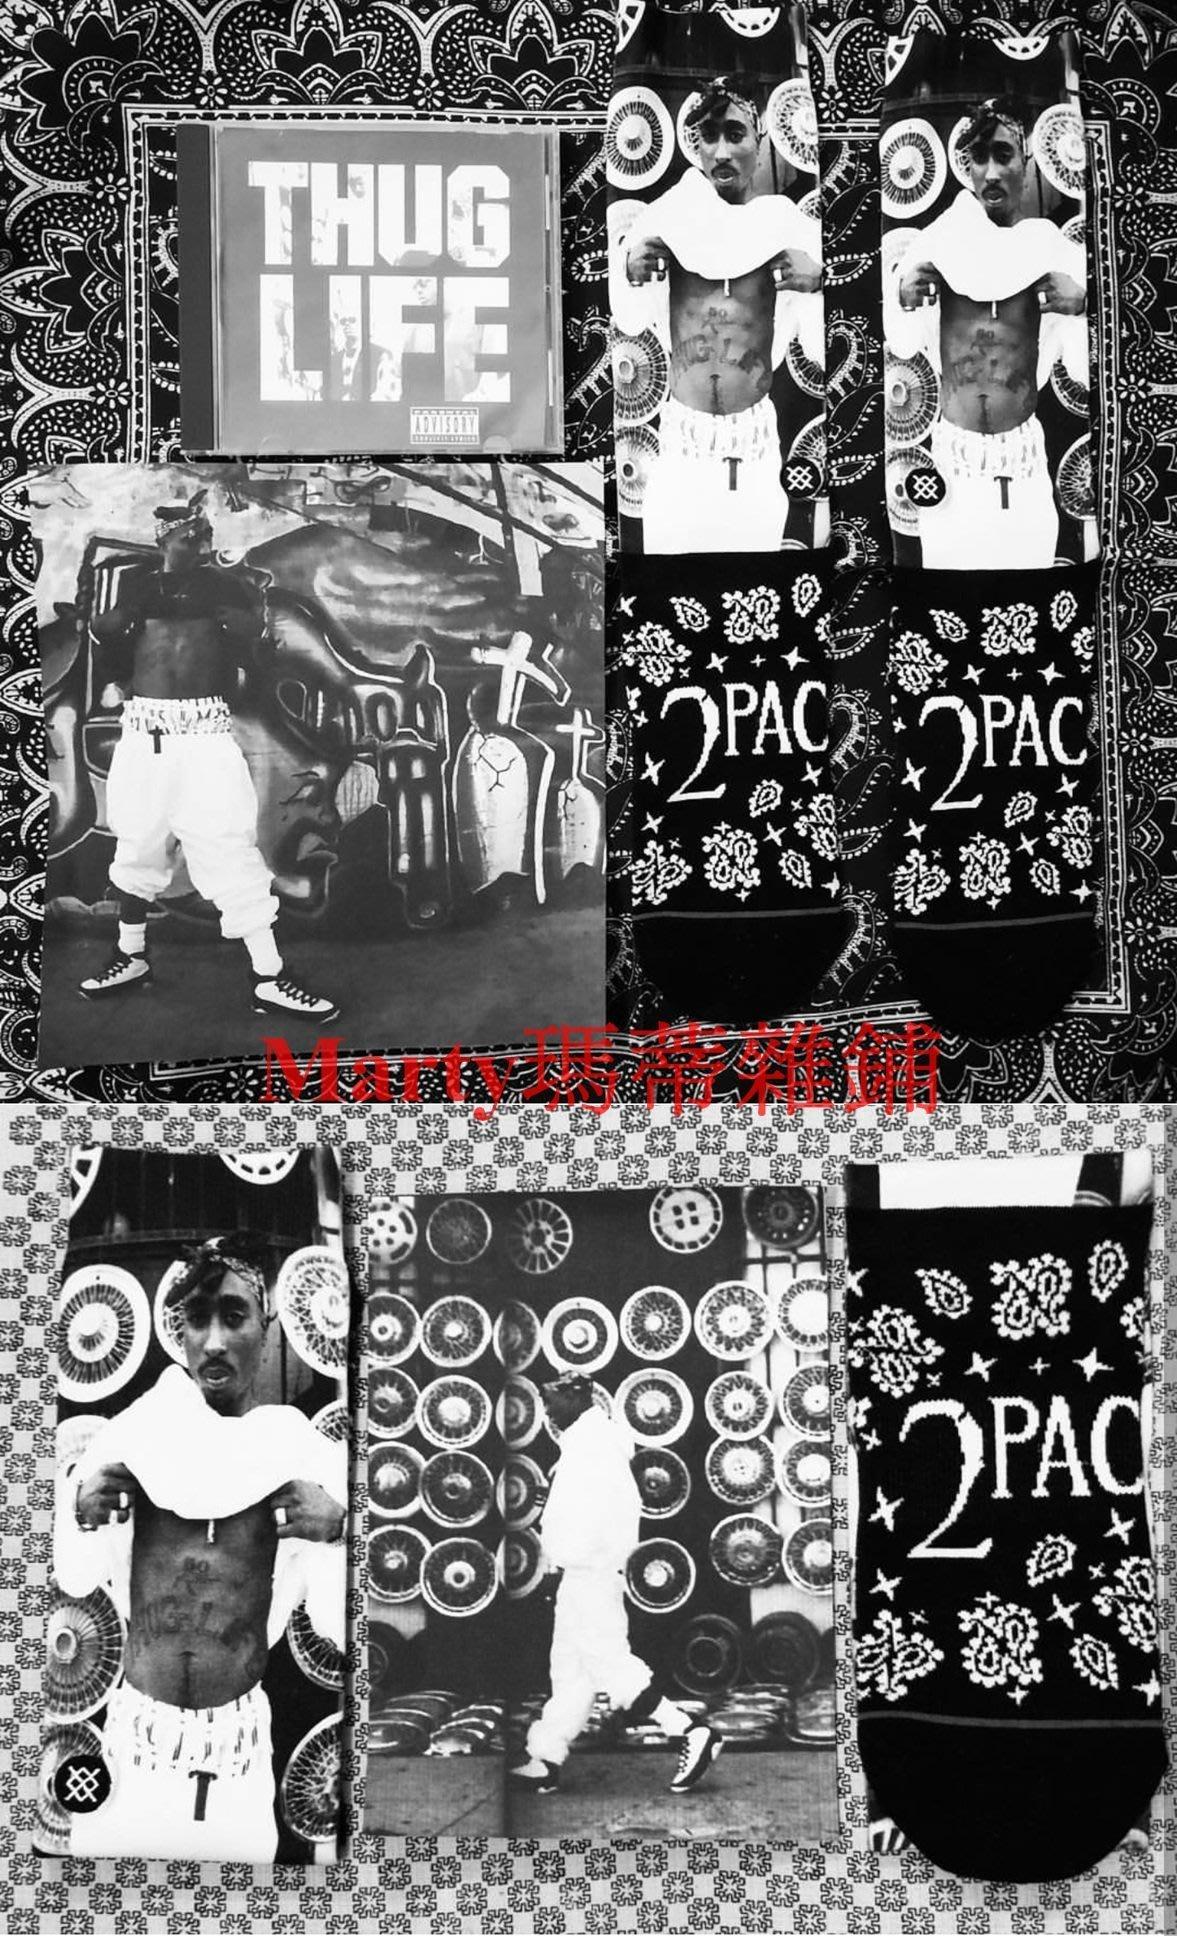 8914353a627c56 Stance 傳奇嘻哈饒舌巨星Tupac BANDANA 中筒襪襪子NBA 街頭潮流EQT ...